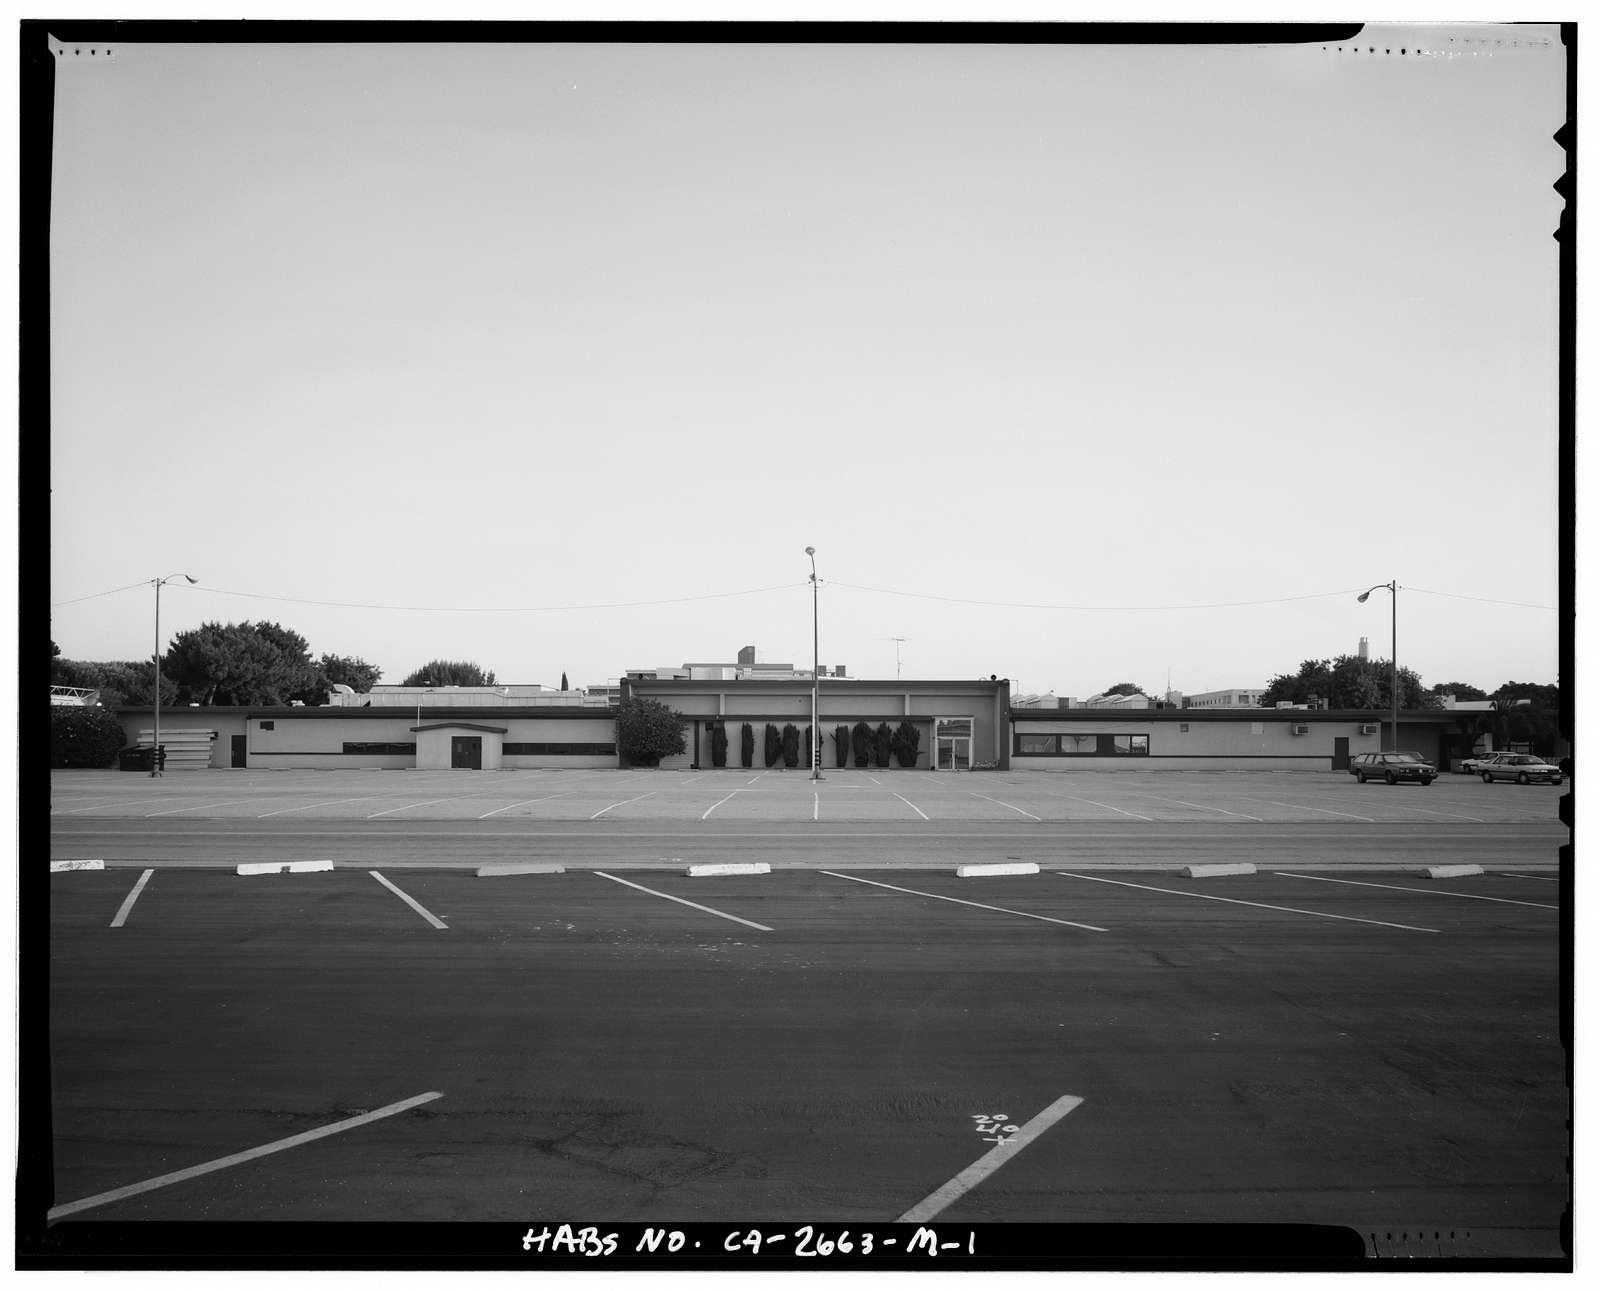 Roosevelt Base, Fleet Landing Building, Bounded by Richardson & Pratt Avenues, Maryland & West Virginia Streets, Long Beach, Los Angeles County, CA